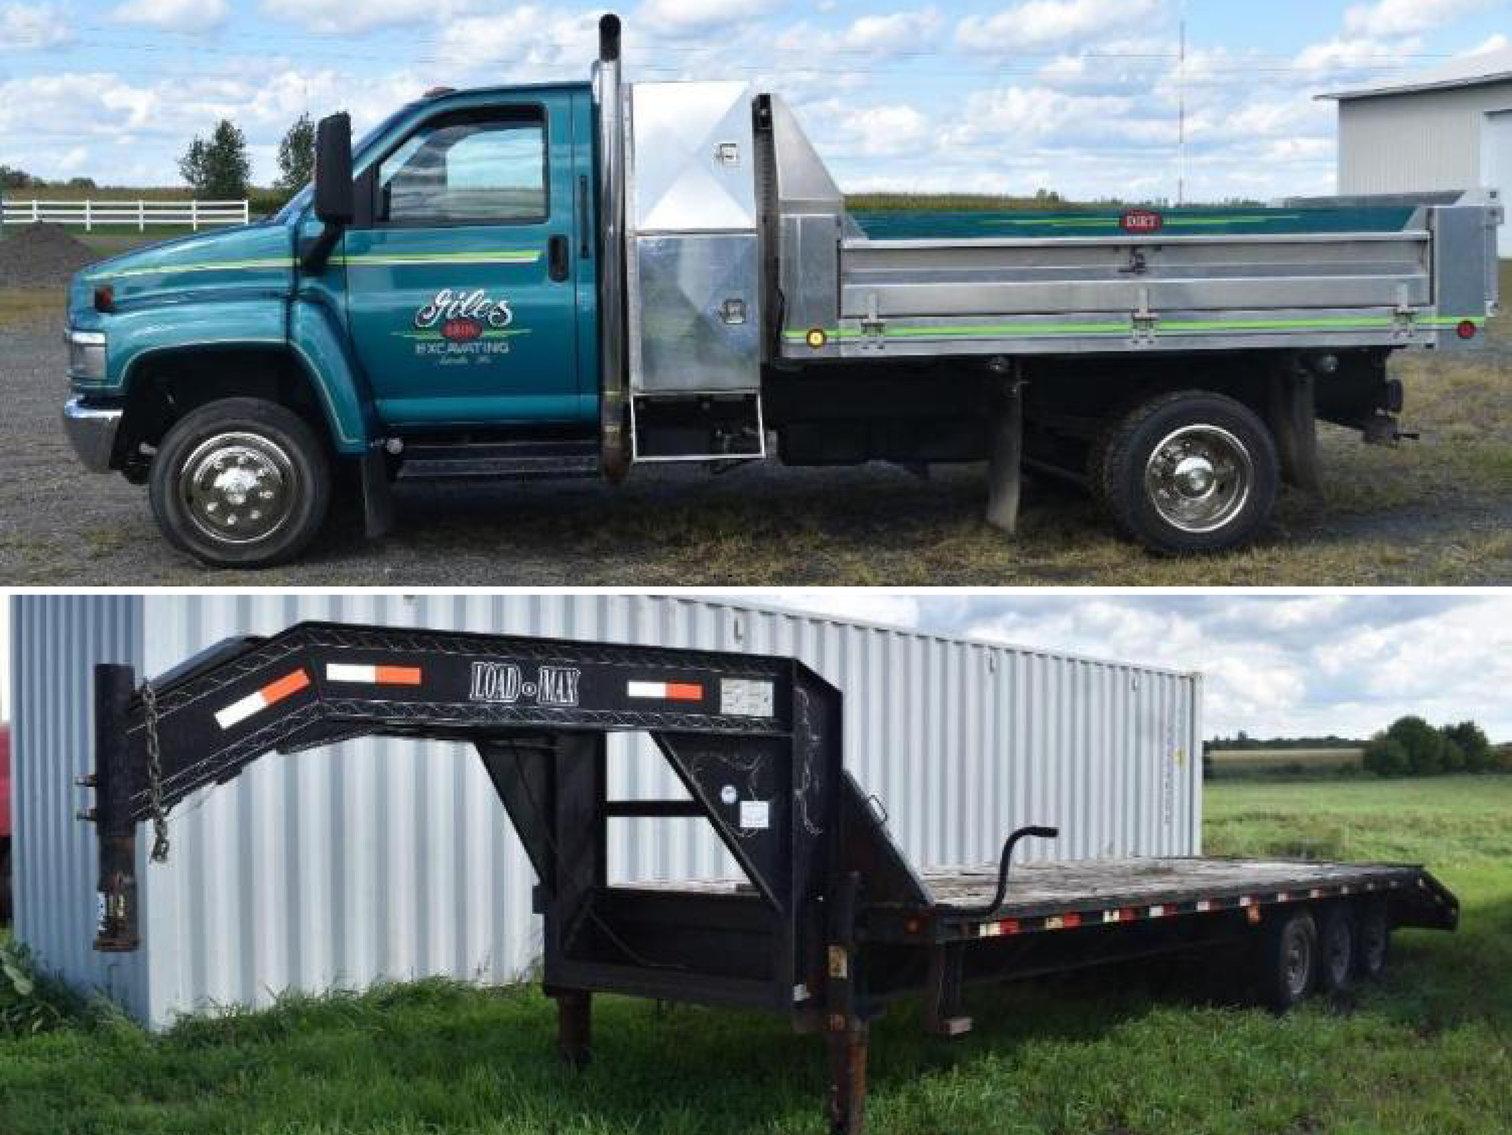 2003 Chevrolet CB C45 Contractors Dump Truck & 2005 Load-Max 28' Tri-Axle Gooseneck Trailer